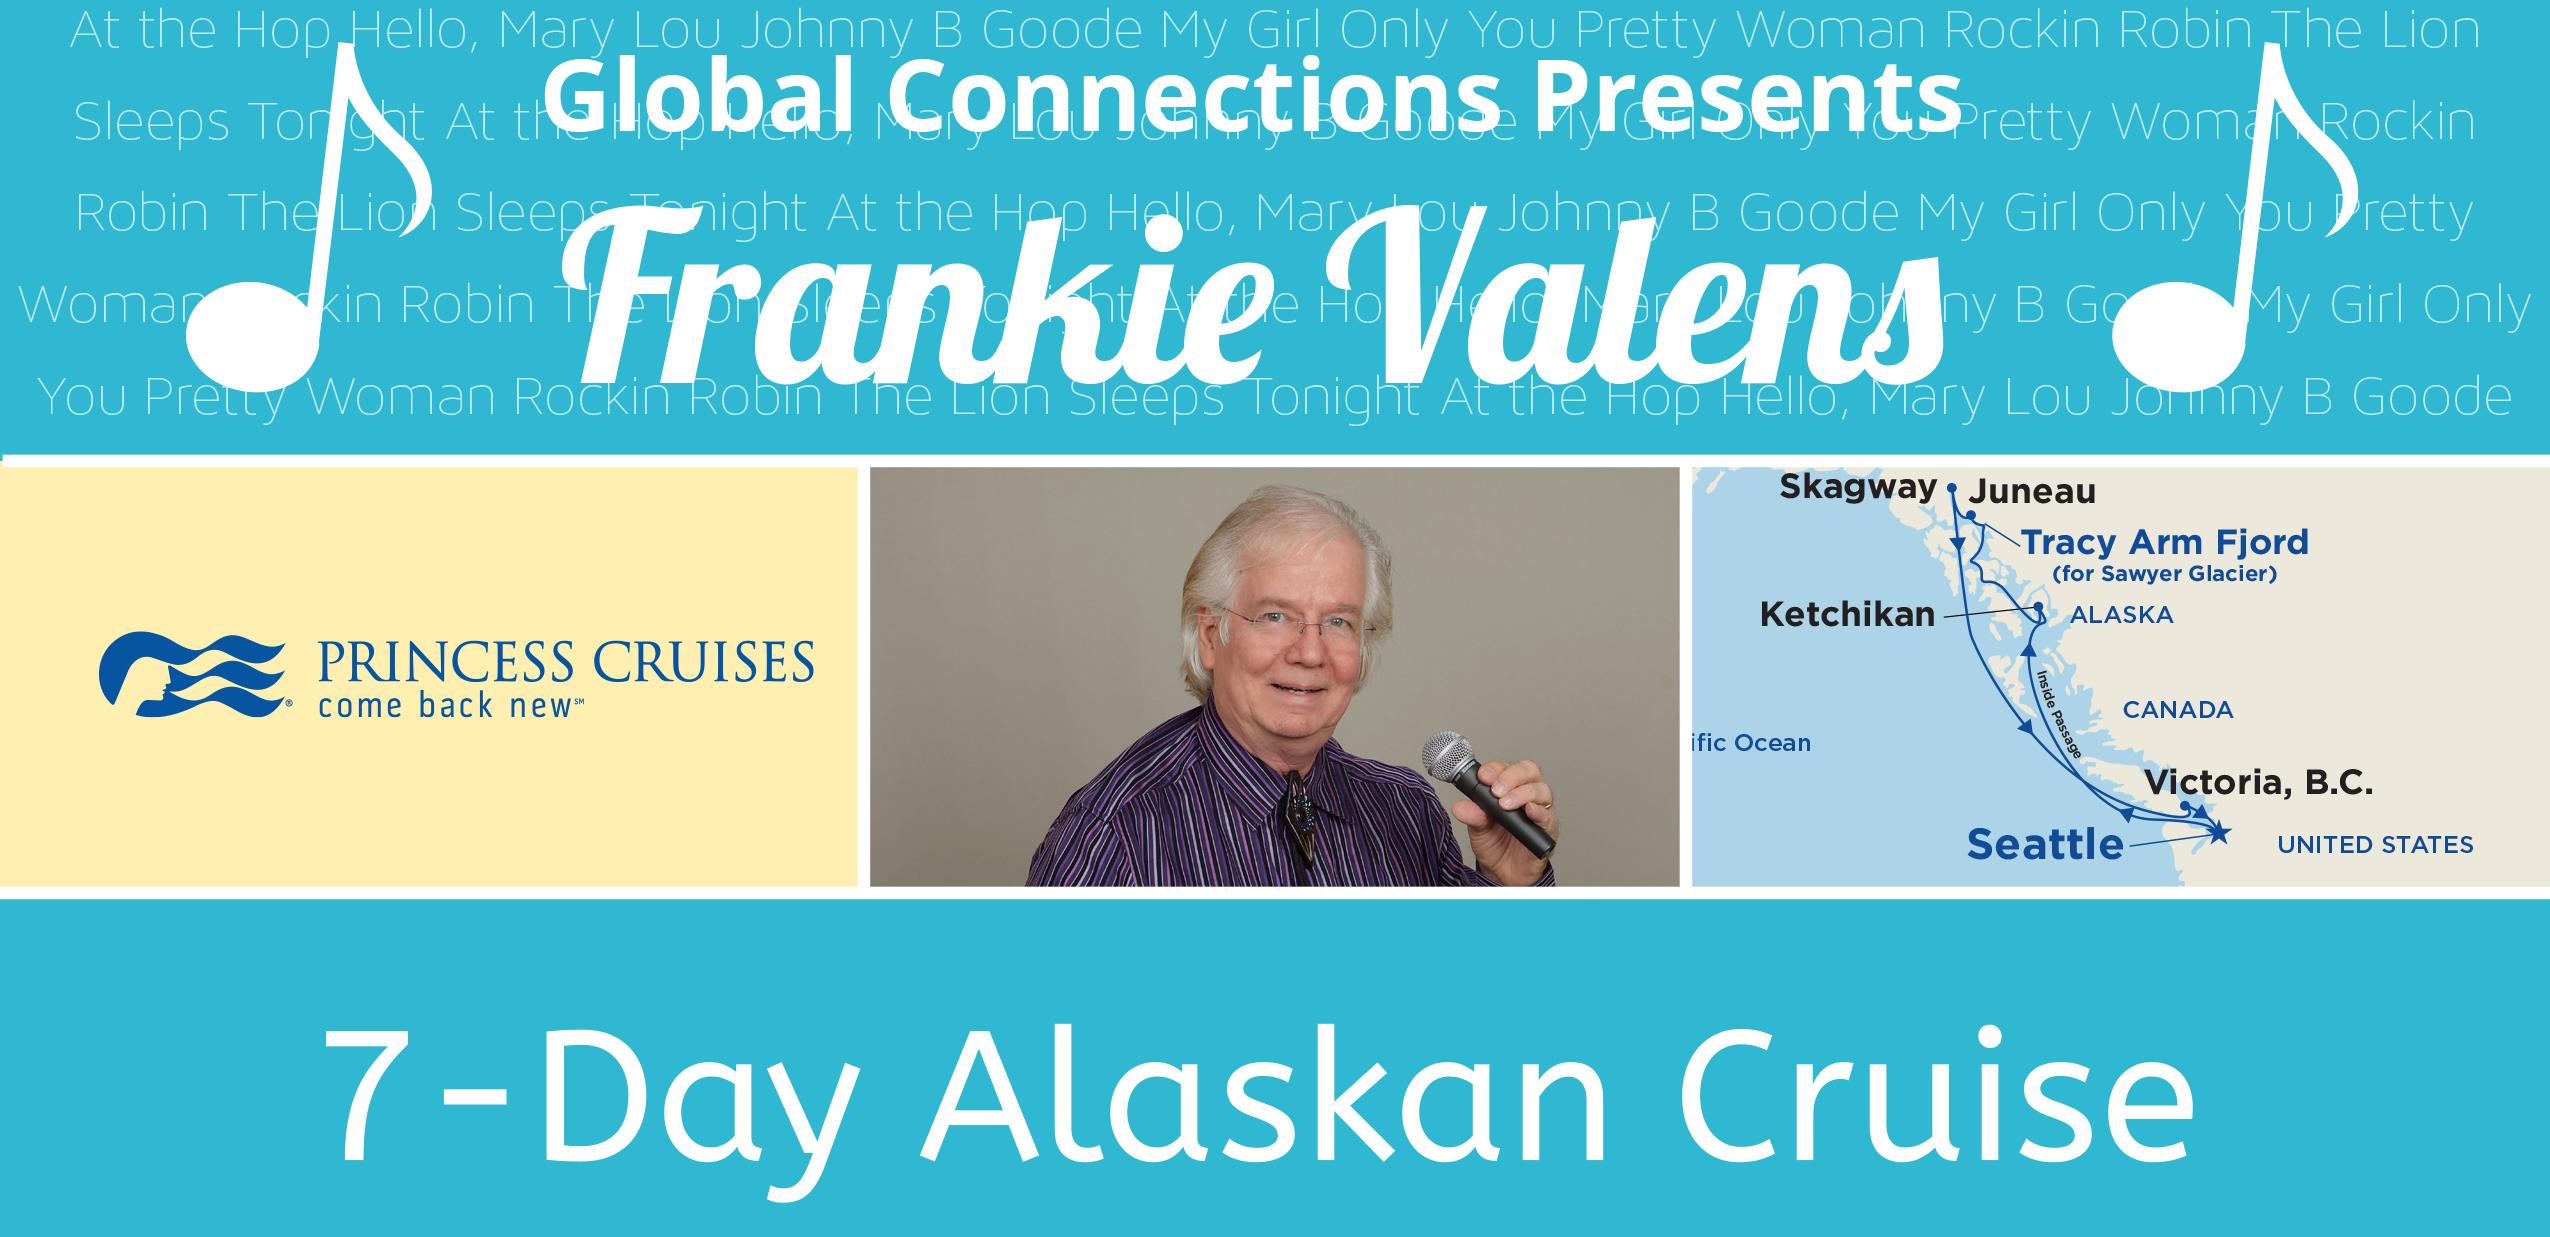 frankie valens global vip cruise